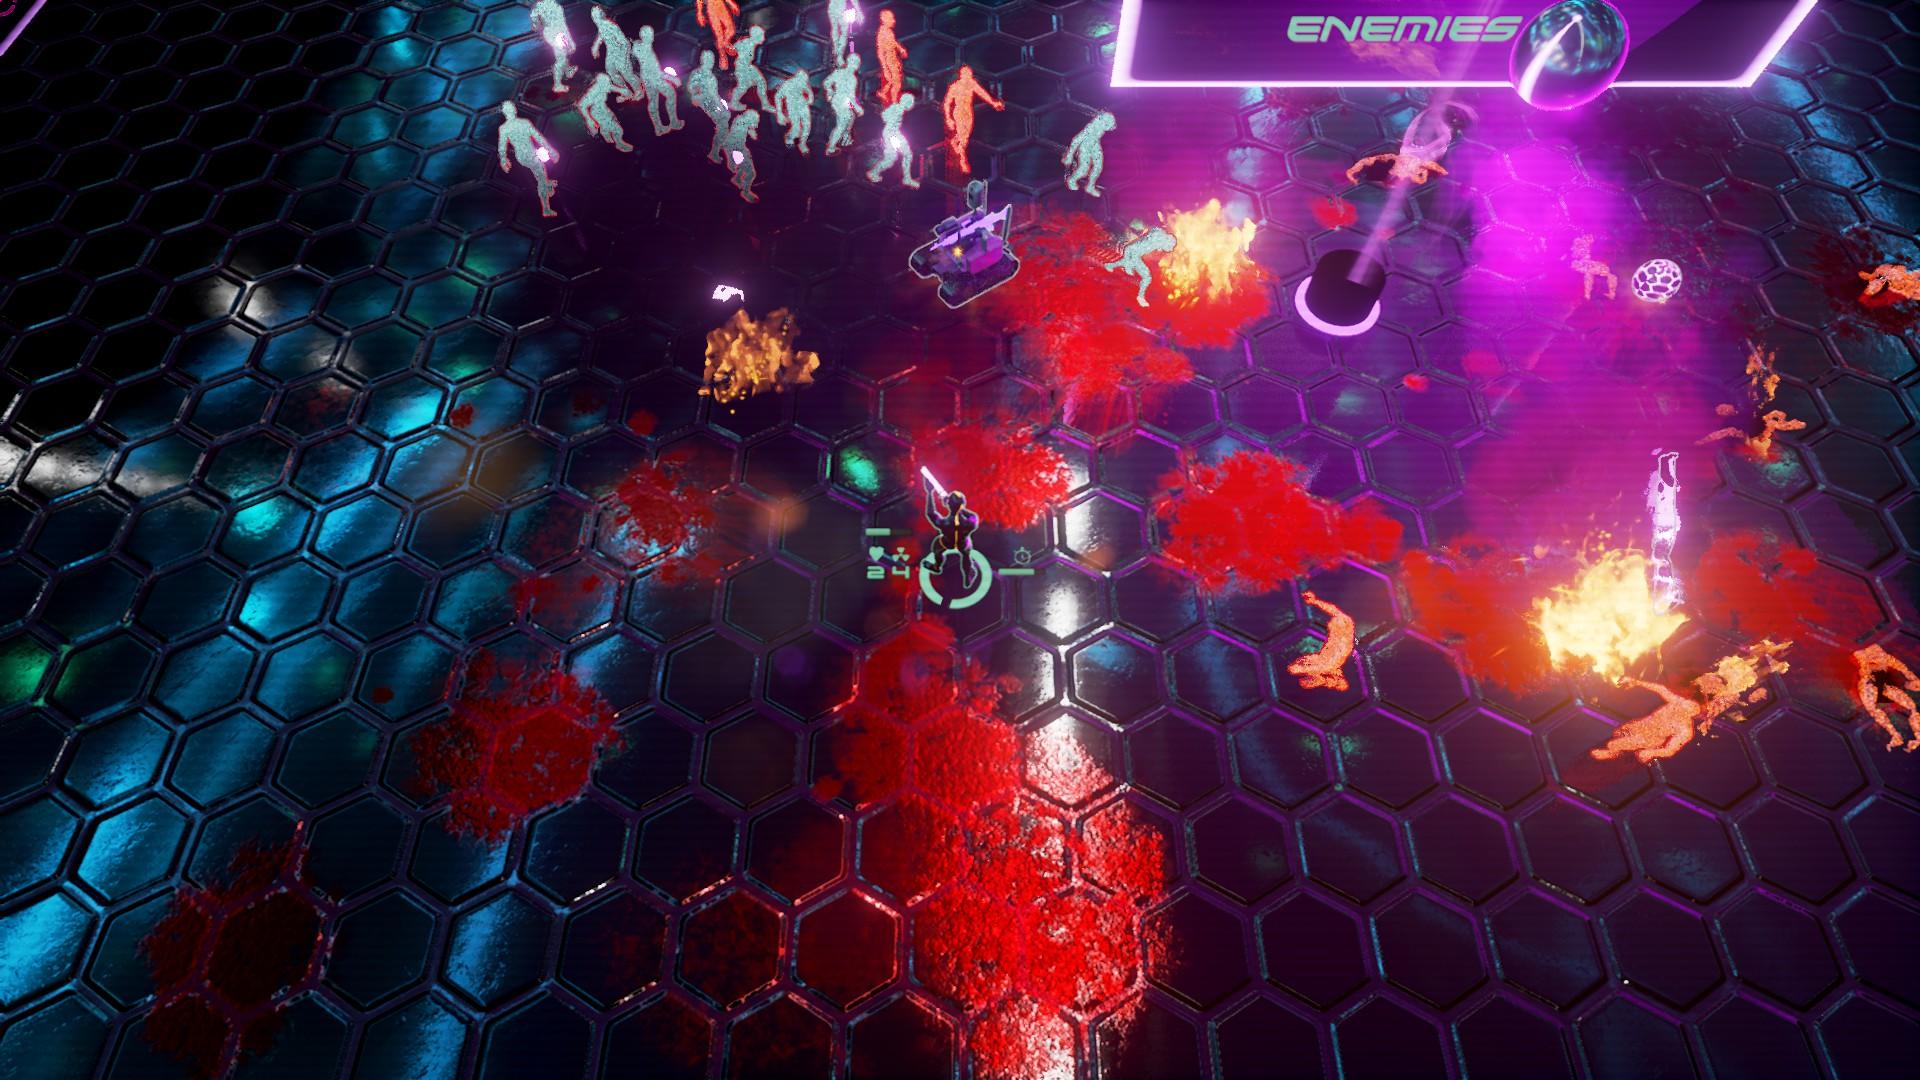 Neon Arena screenshot